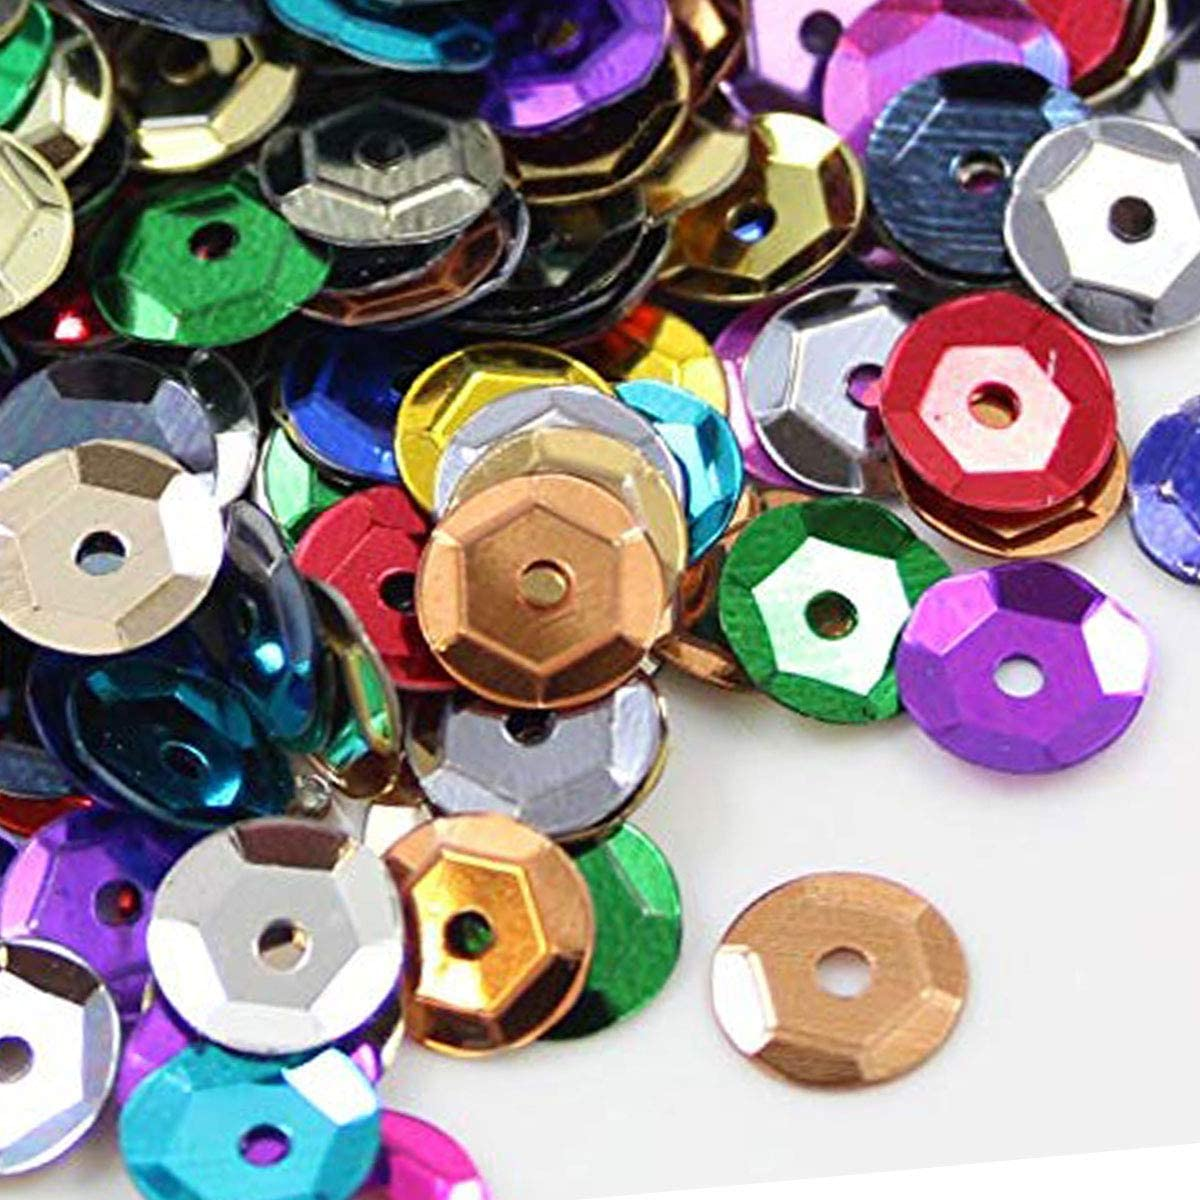 Sequins, 1600 Pcs Perforated Sequins Round Multpile Color DIY Crafts Decorations